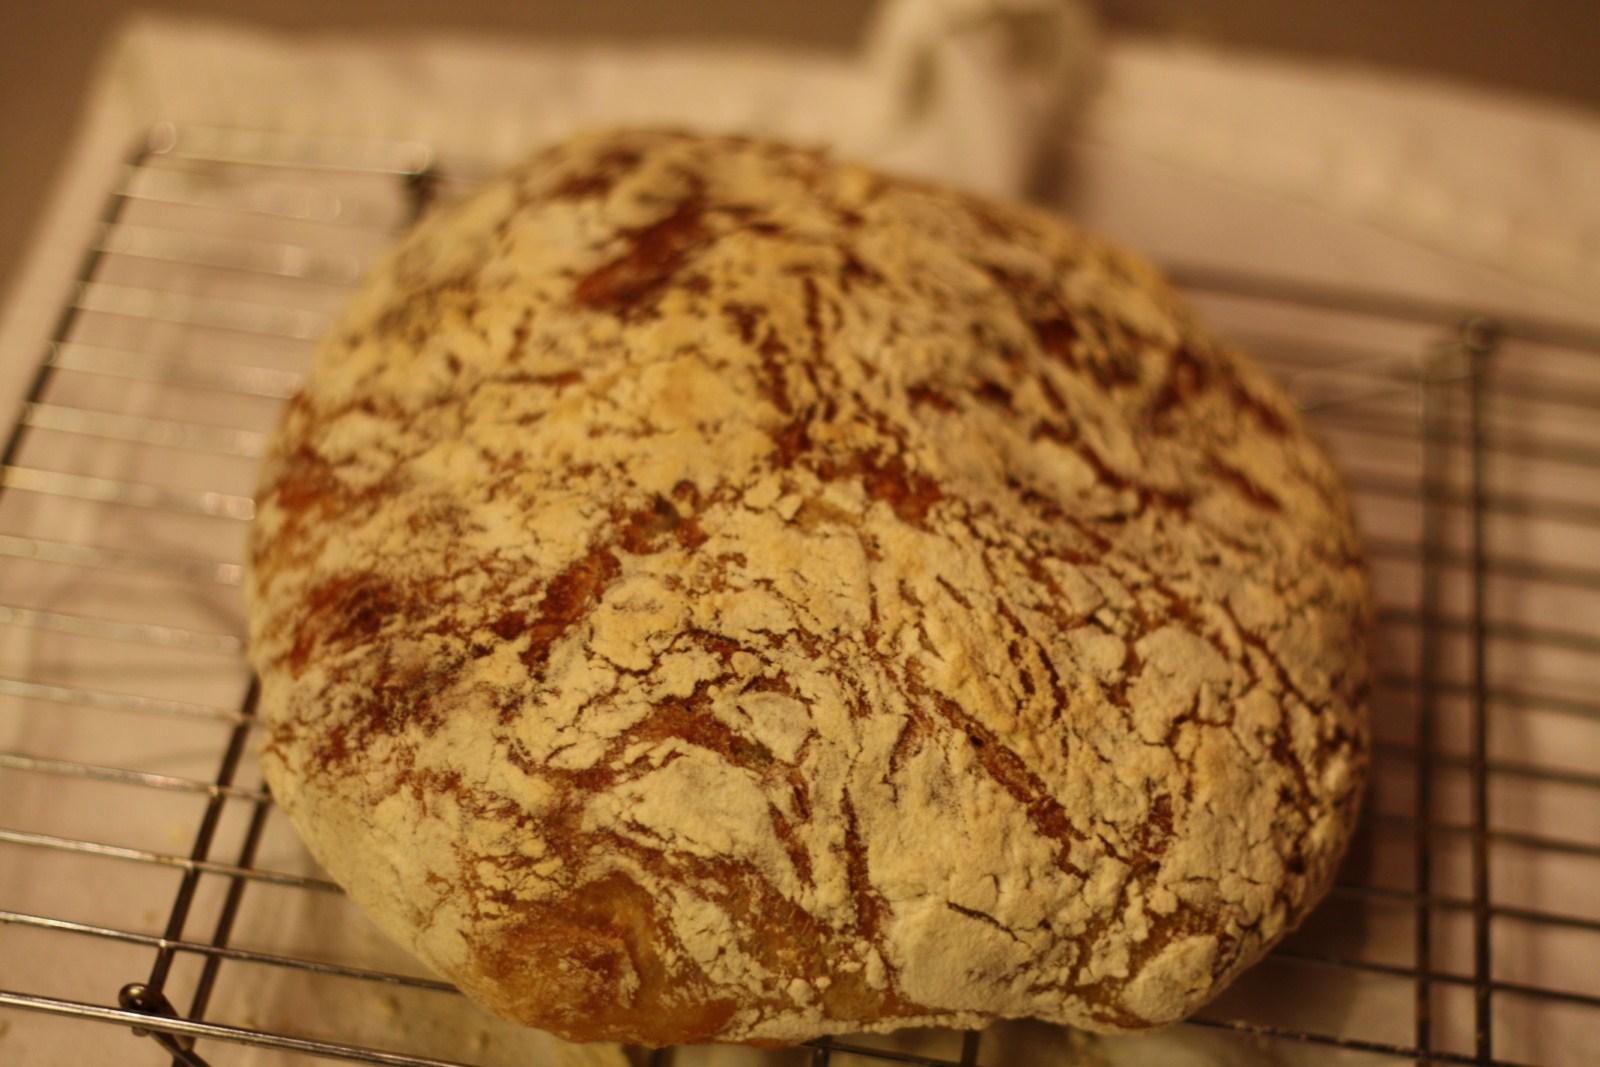 Rye n injun bread